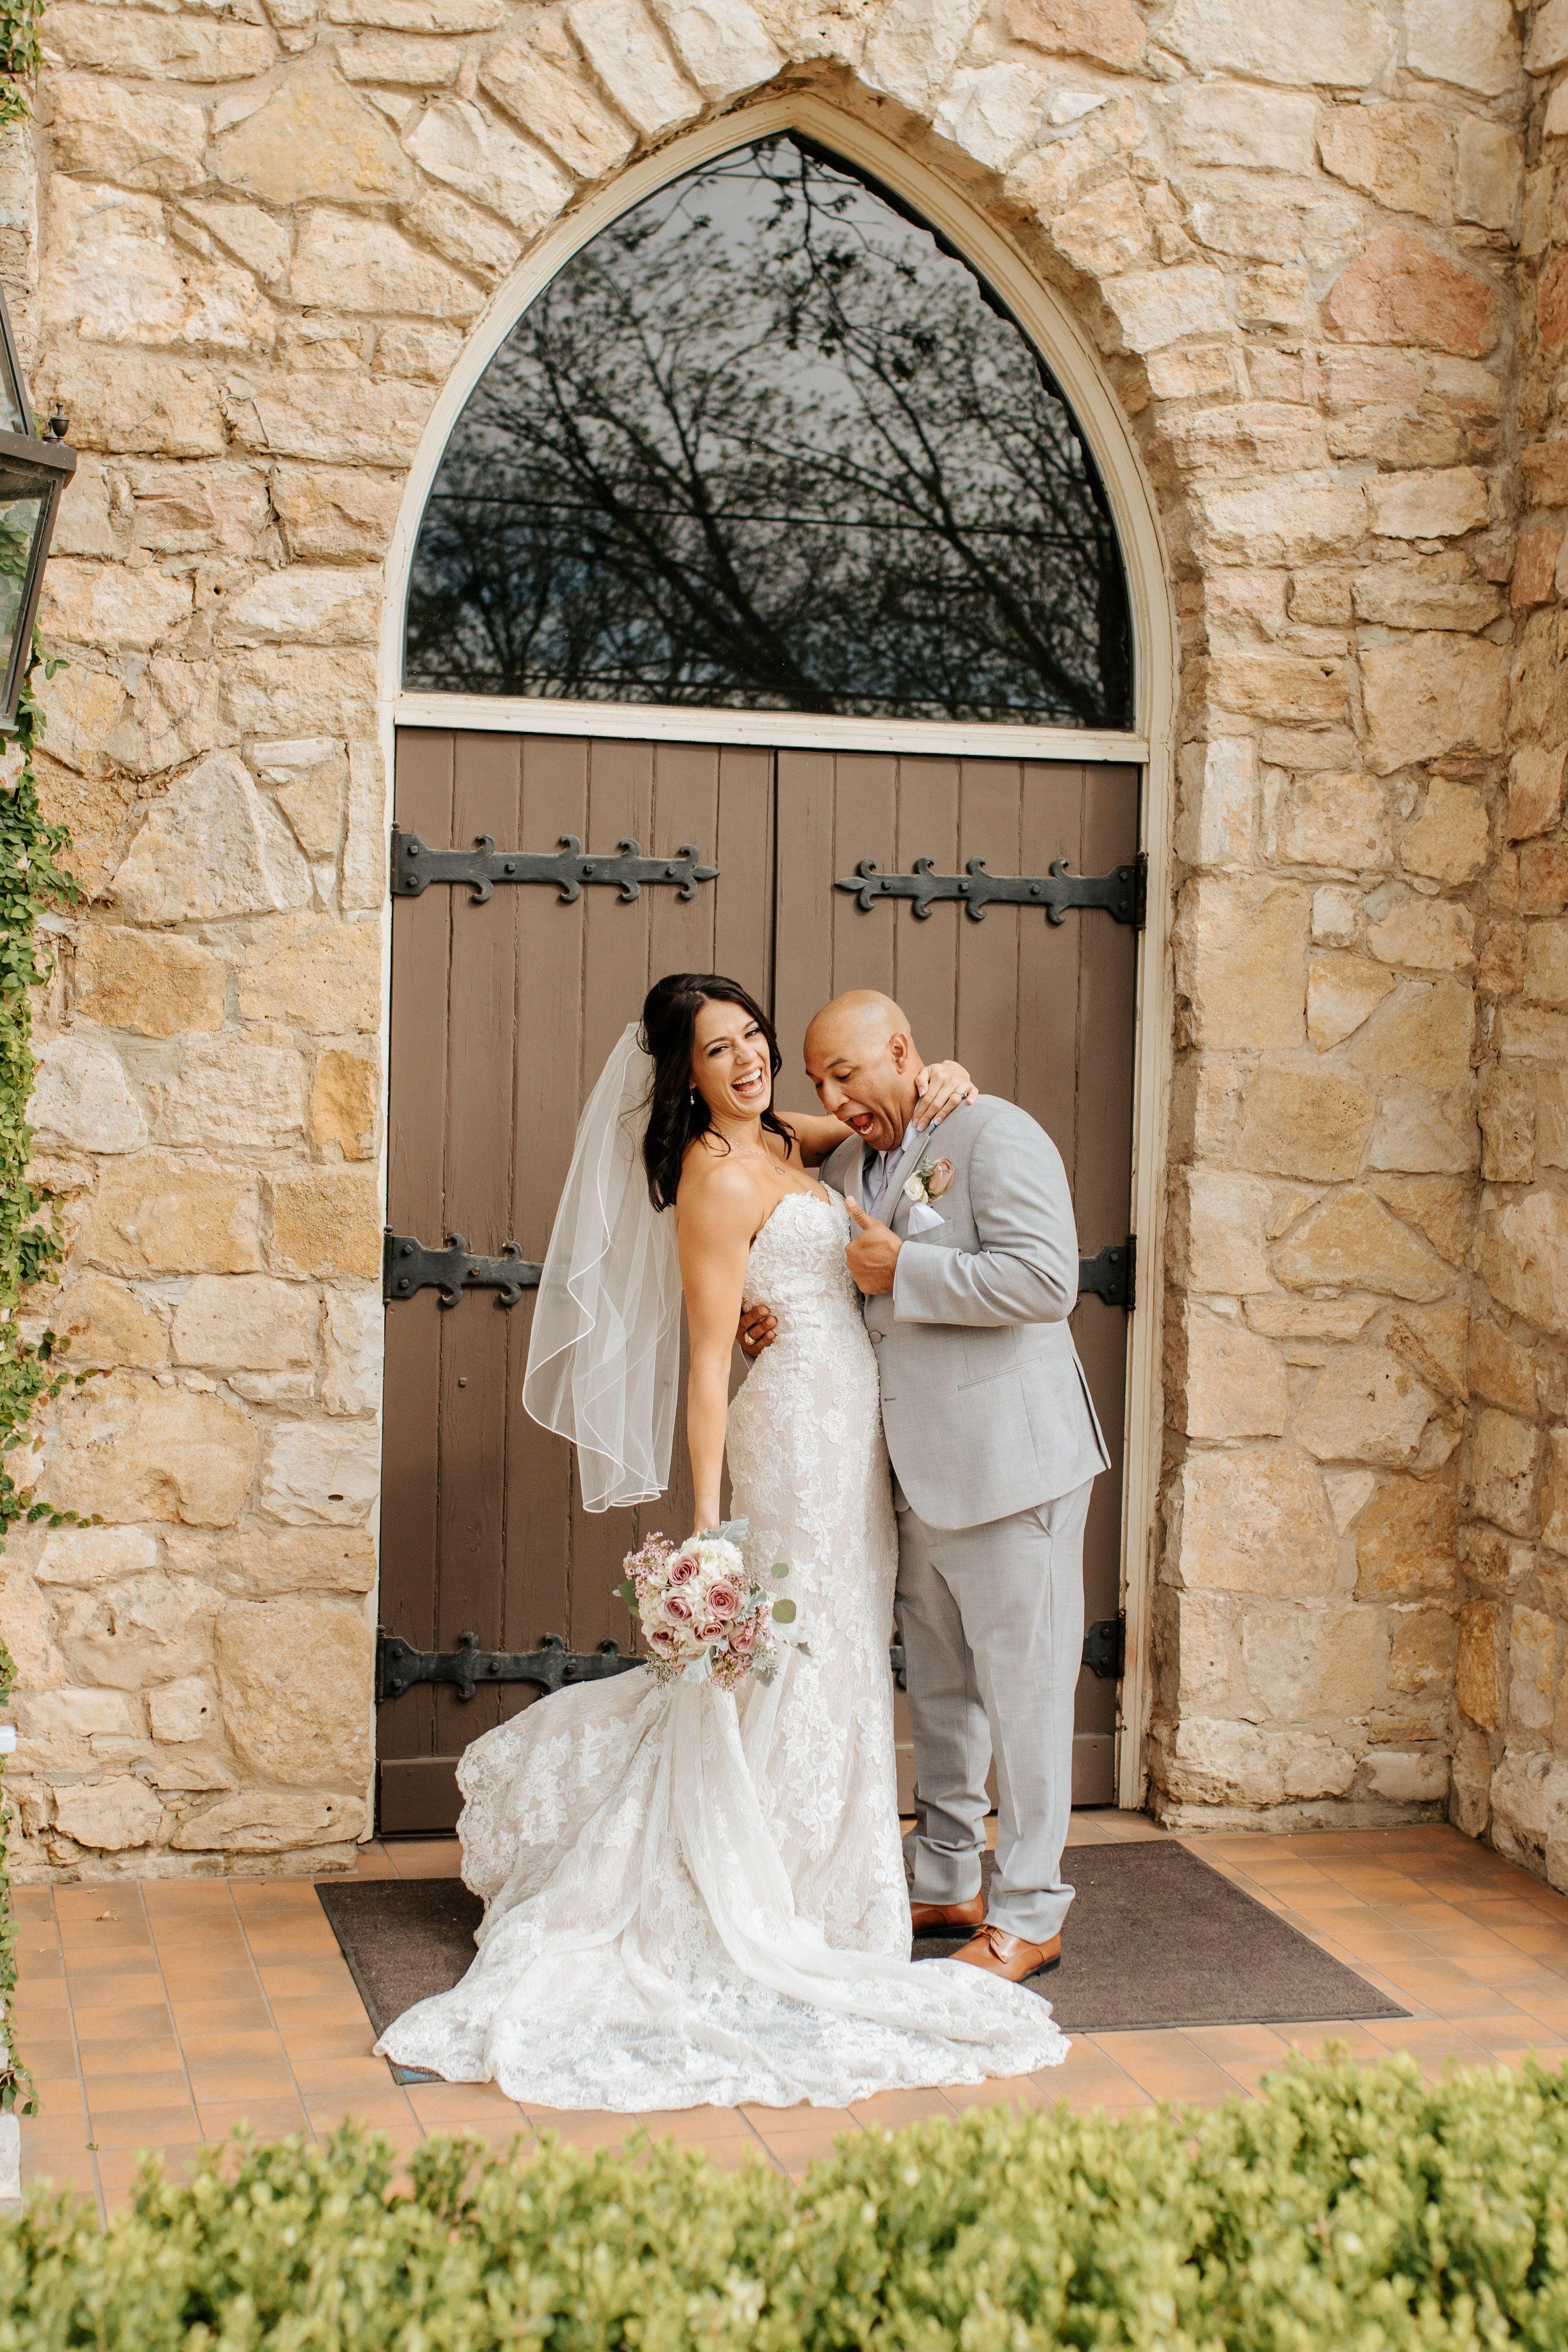 Boerne Wedding Venue Hill Country Tx All Inclusive Wedding Venue